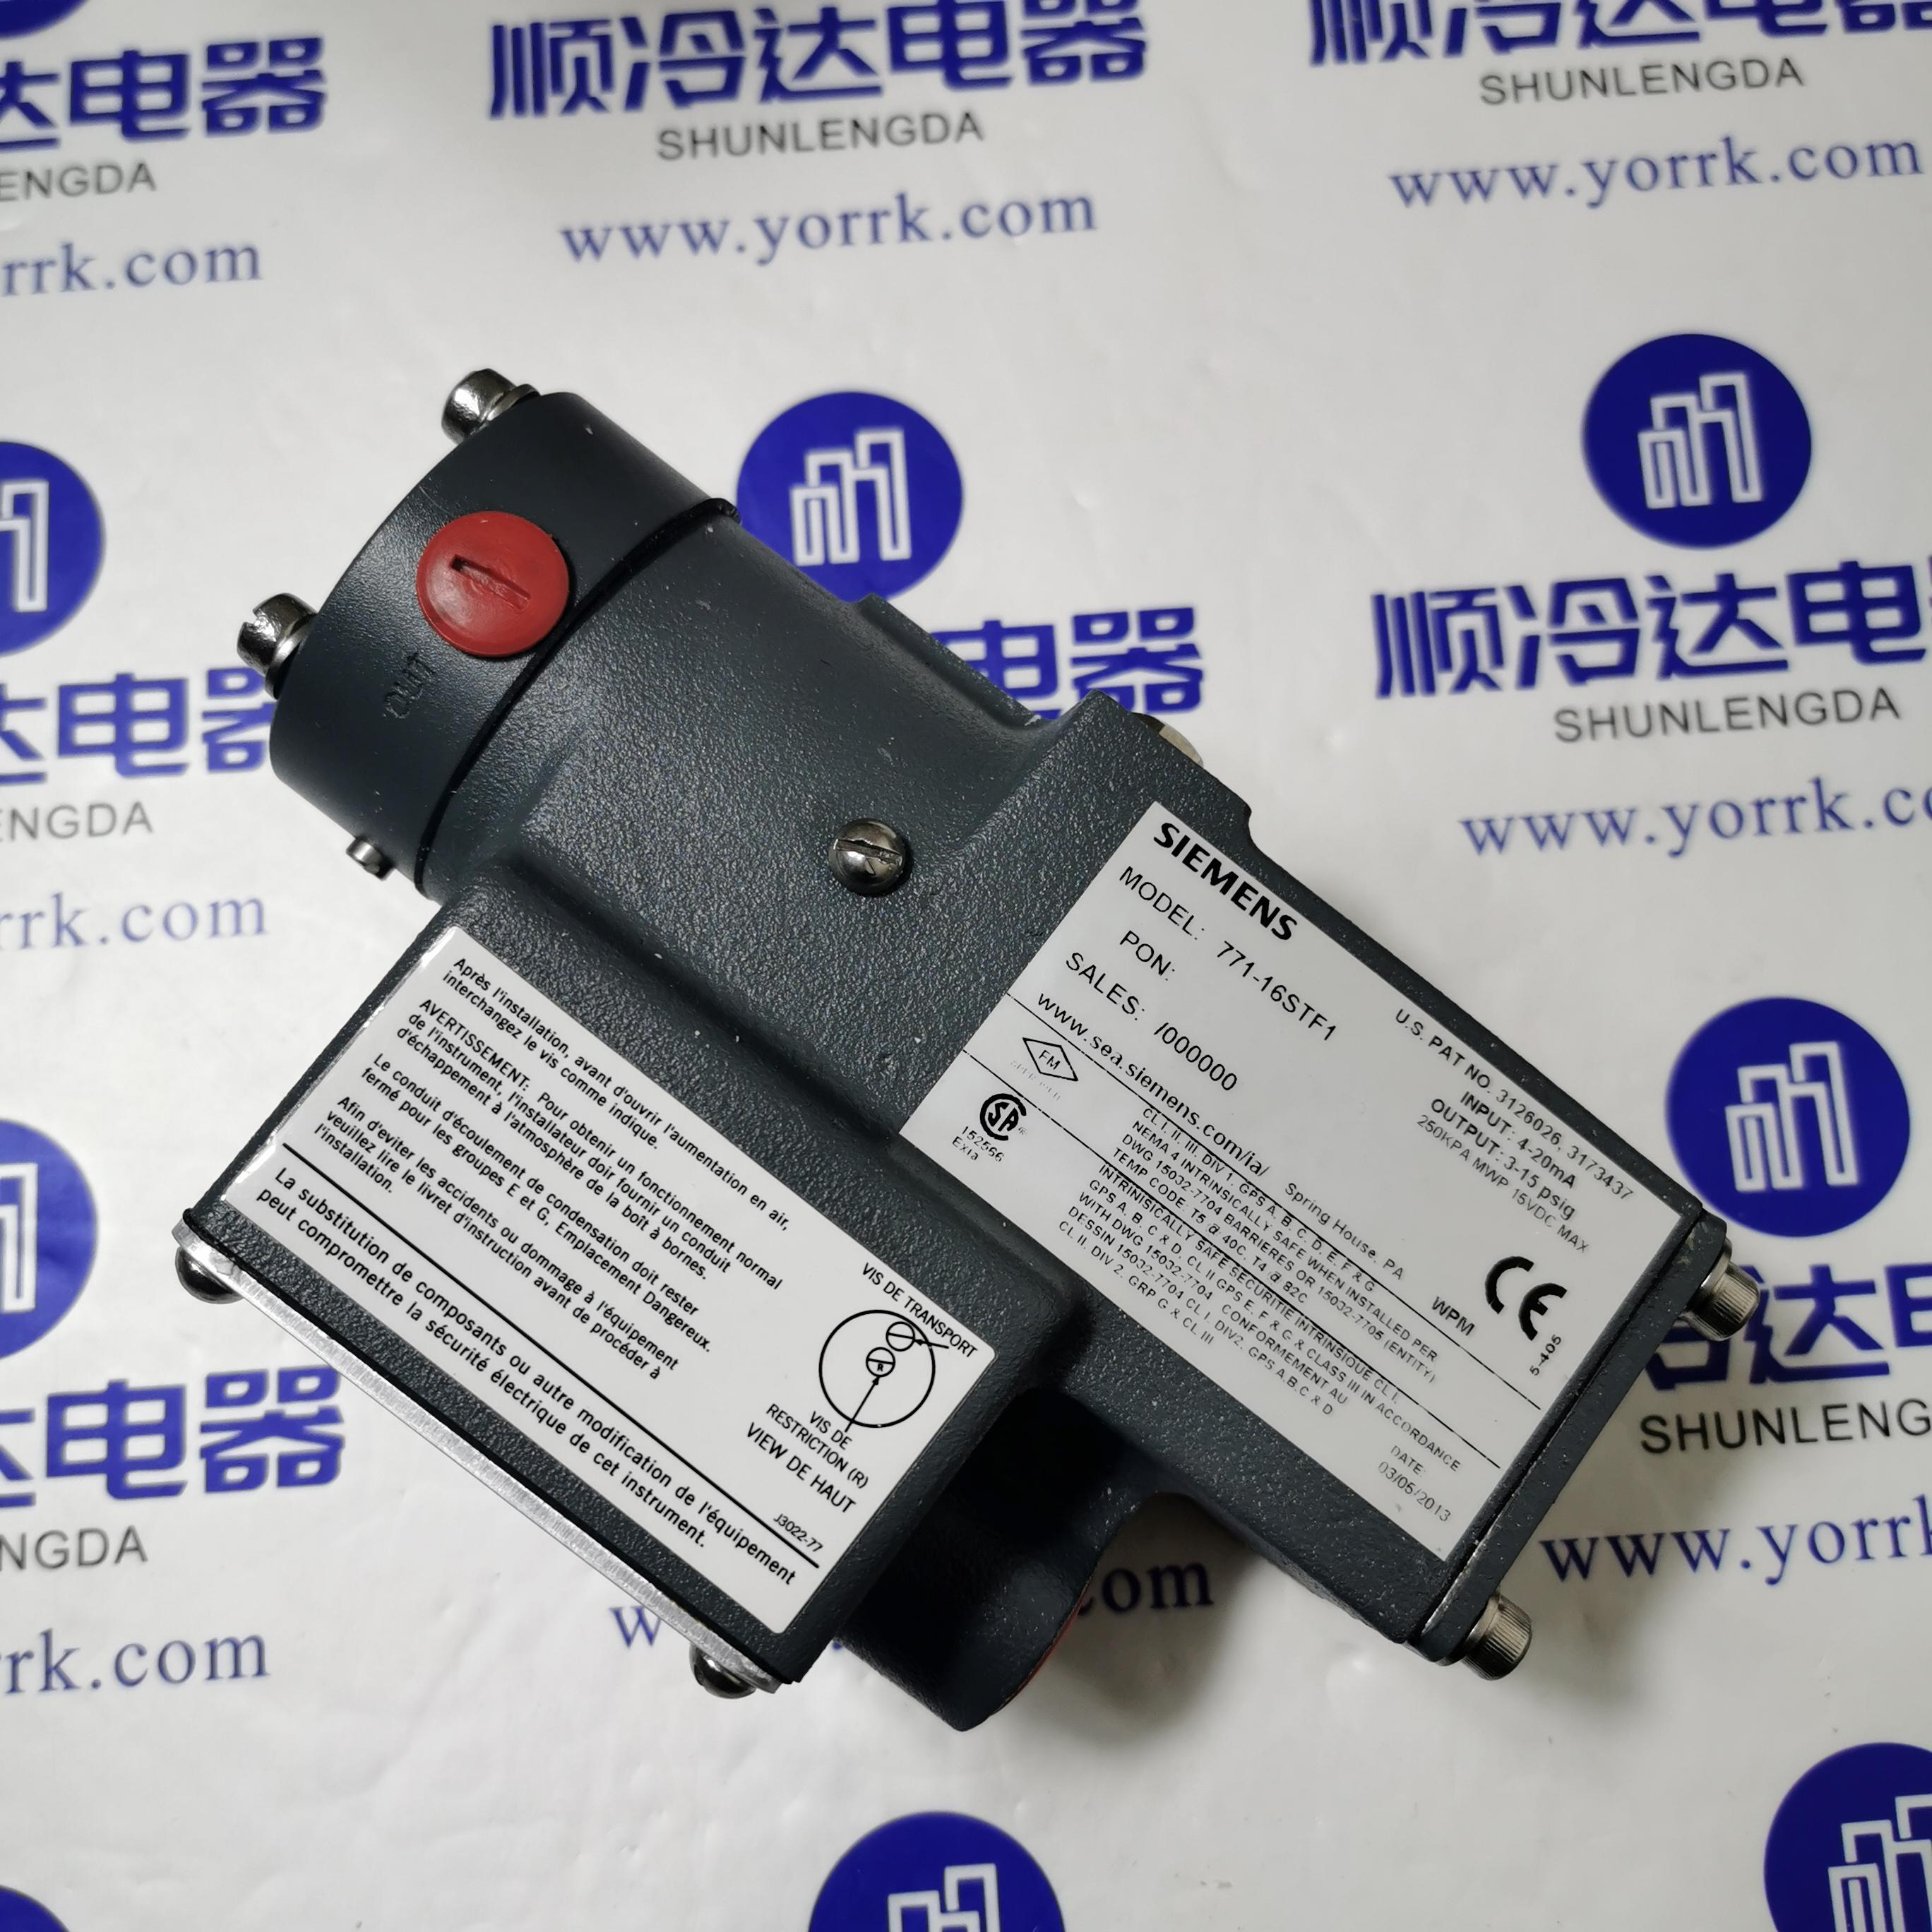 Original air conditioner repair parts Siemens current sensor 771-16STF1